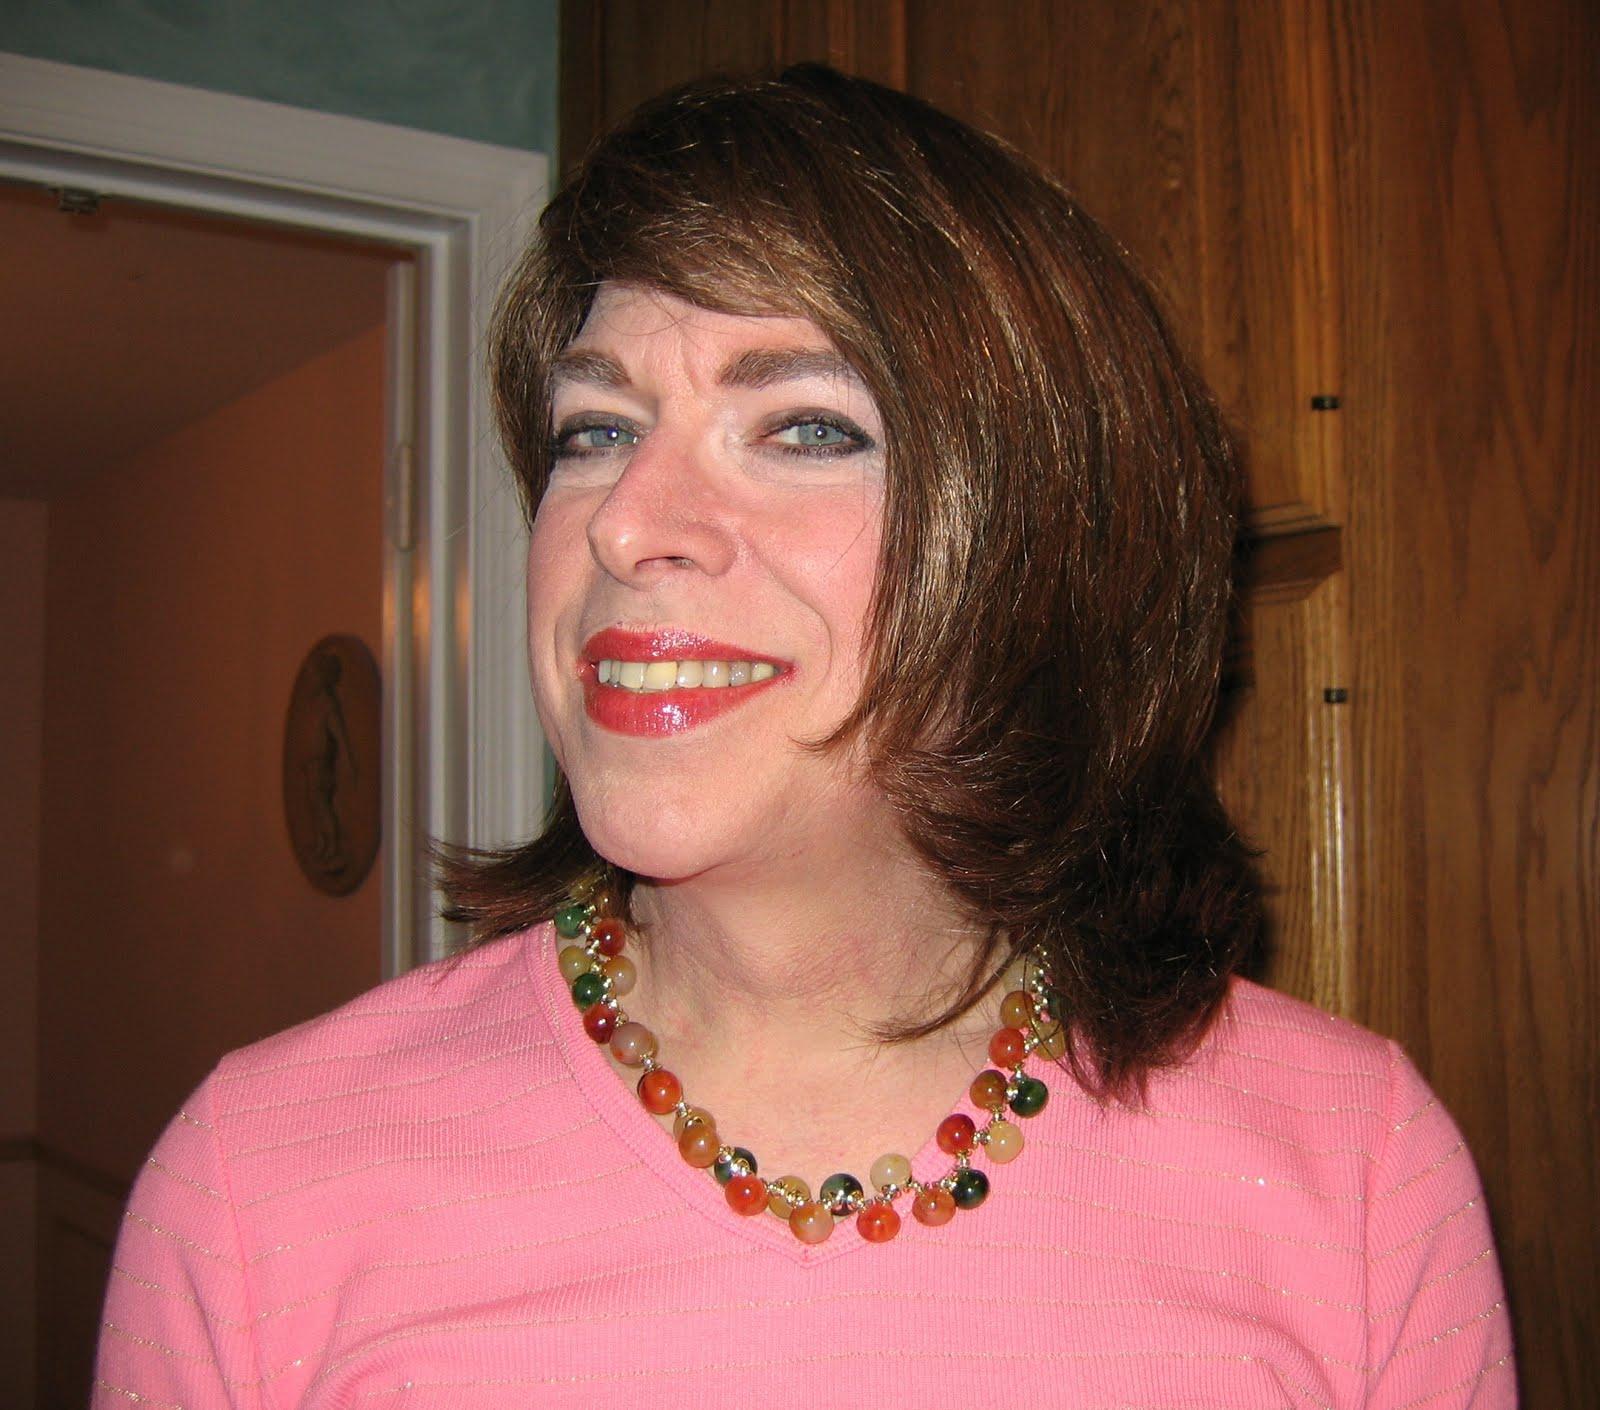 Crossdressing Makeovers In Virginia